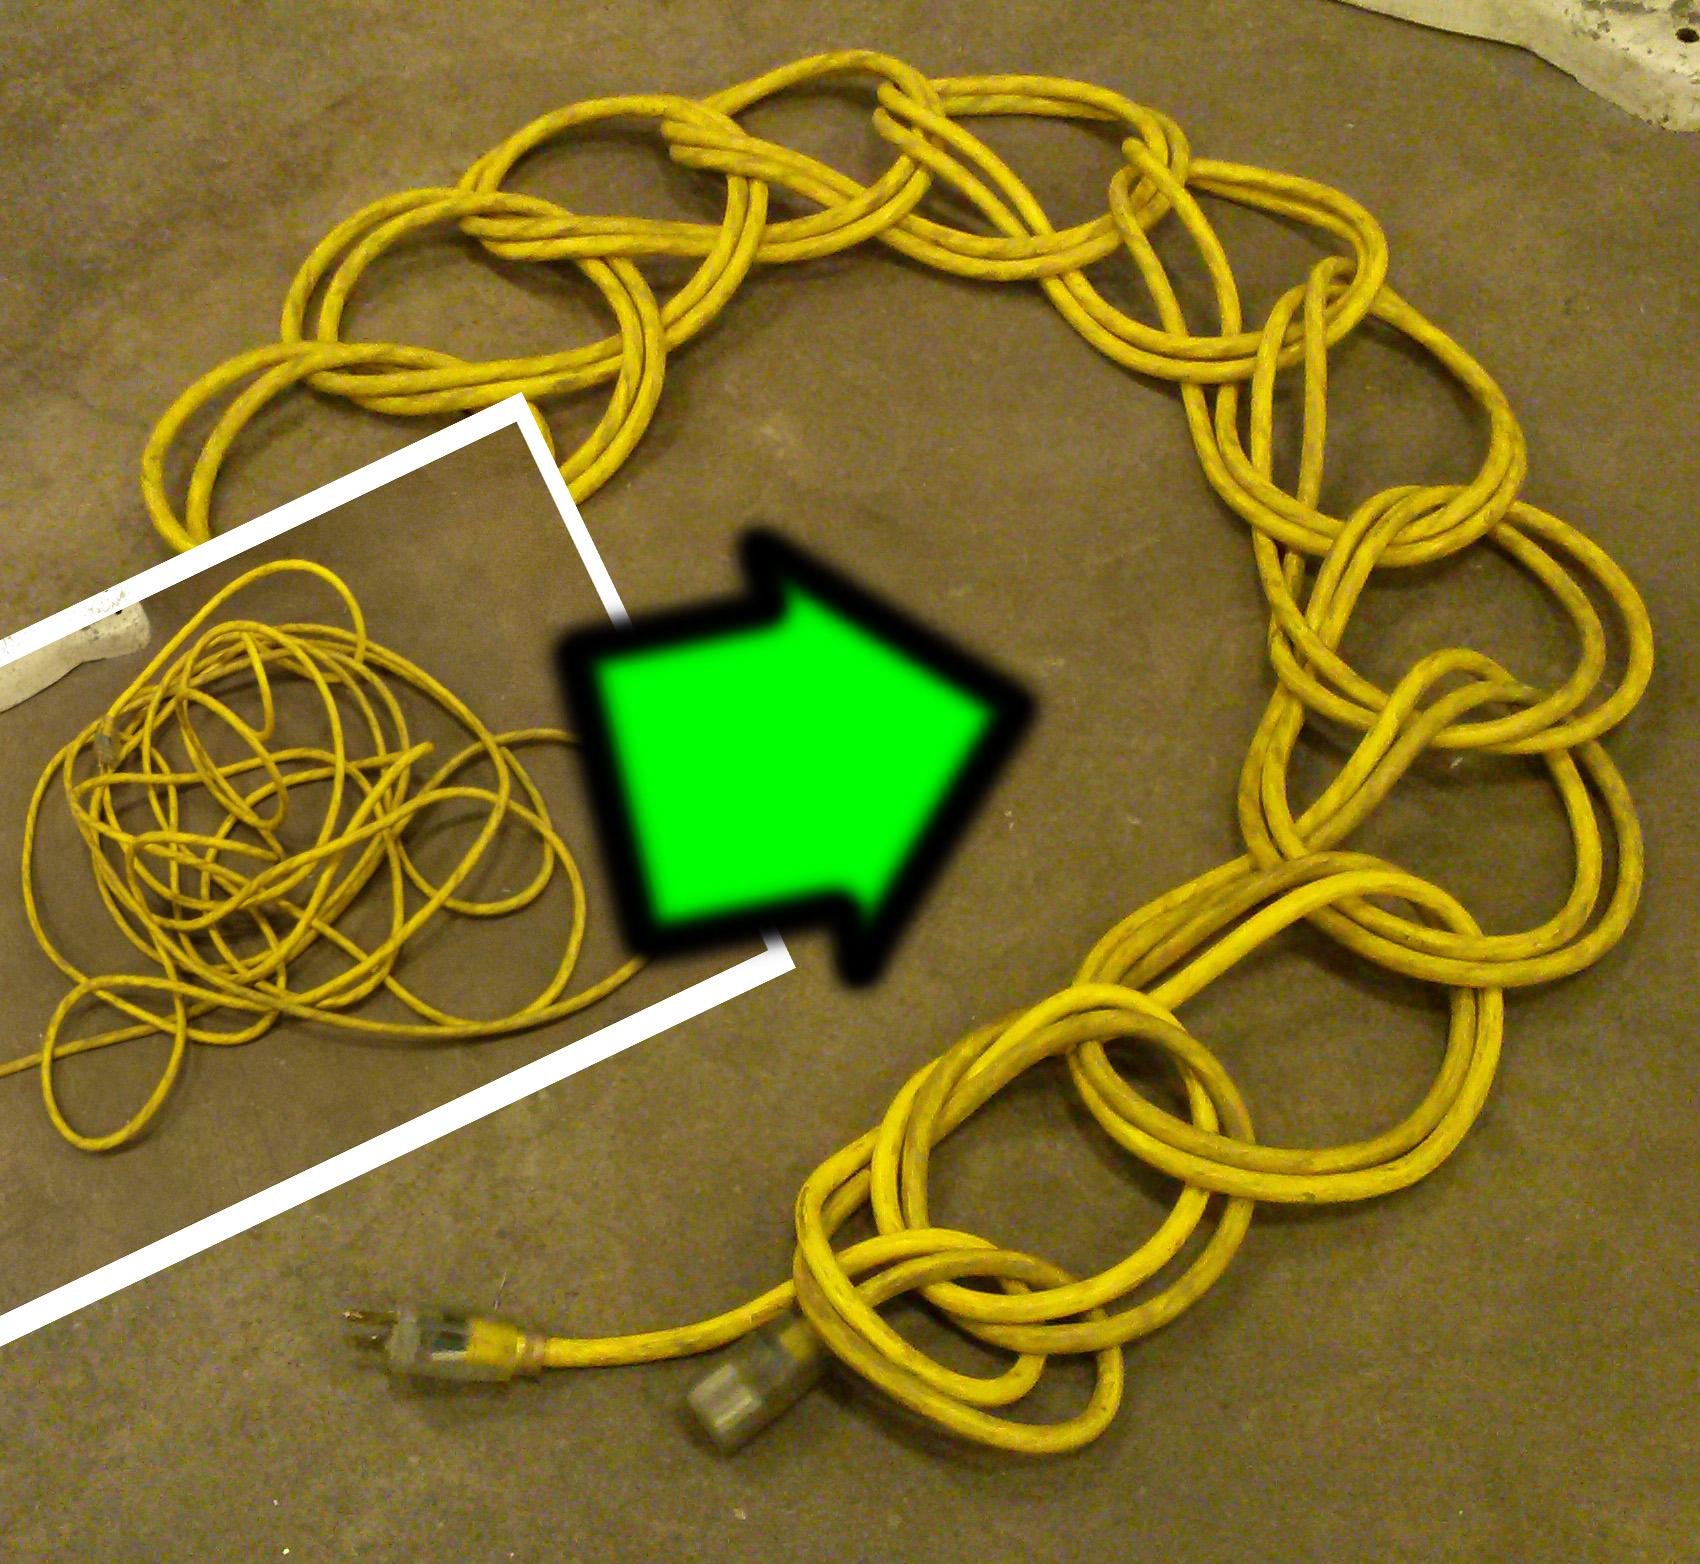 Daisy chain an extension cord